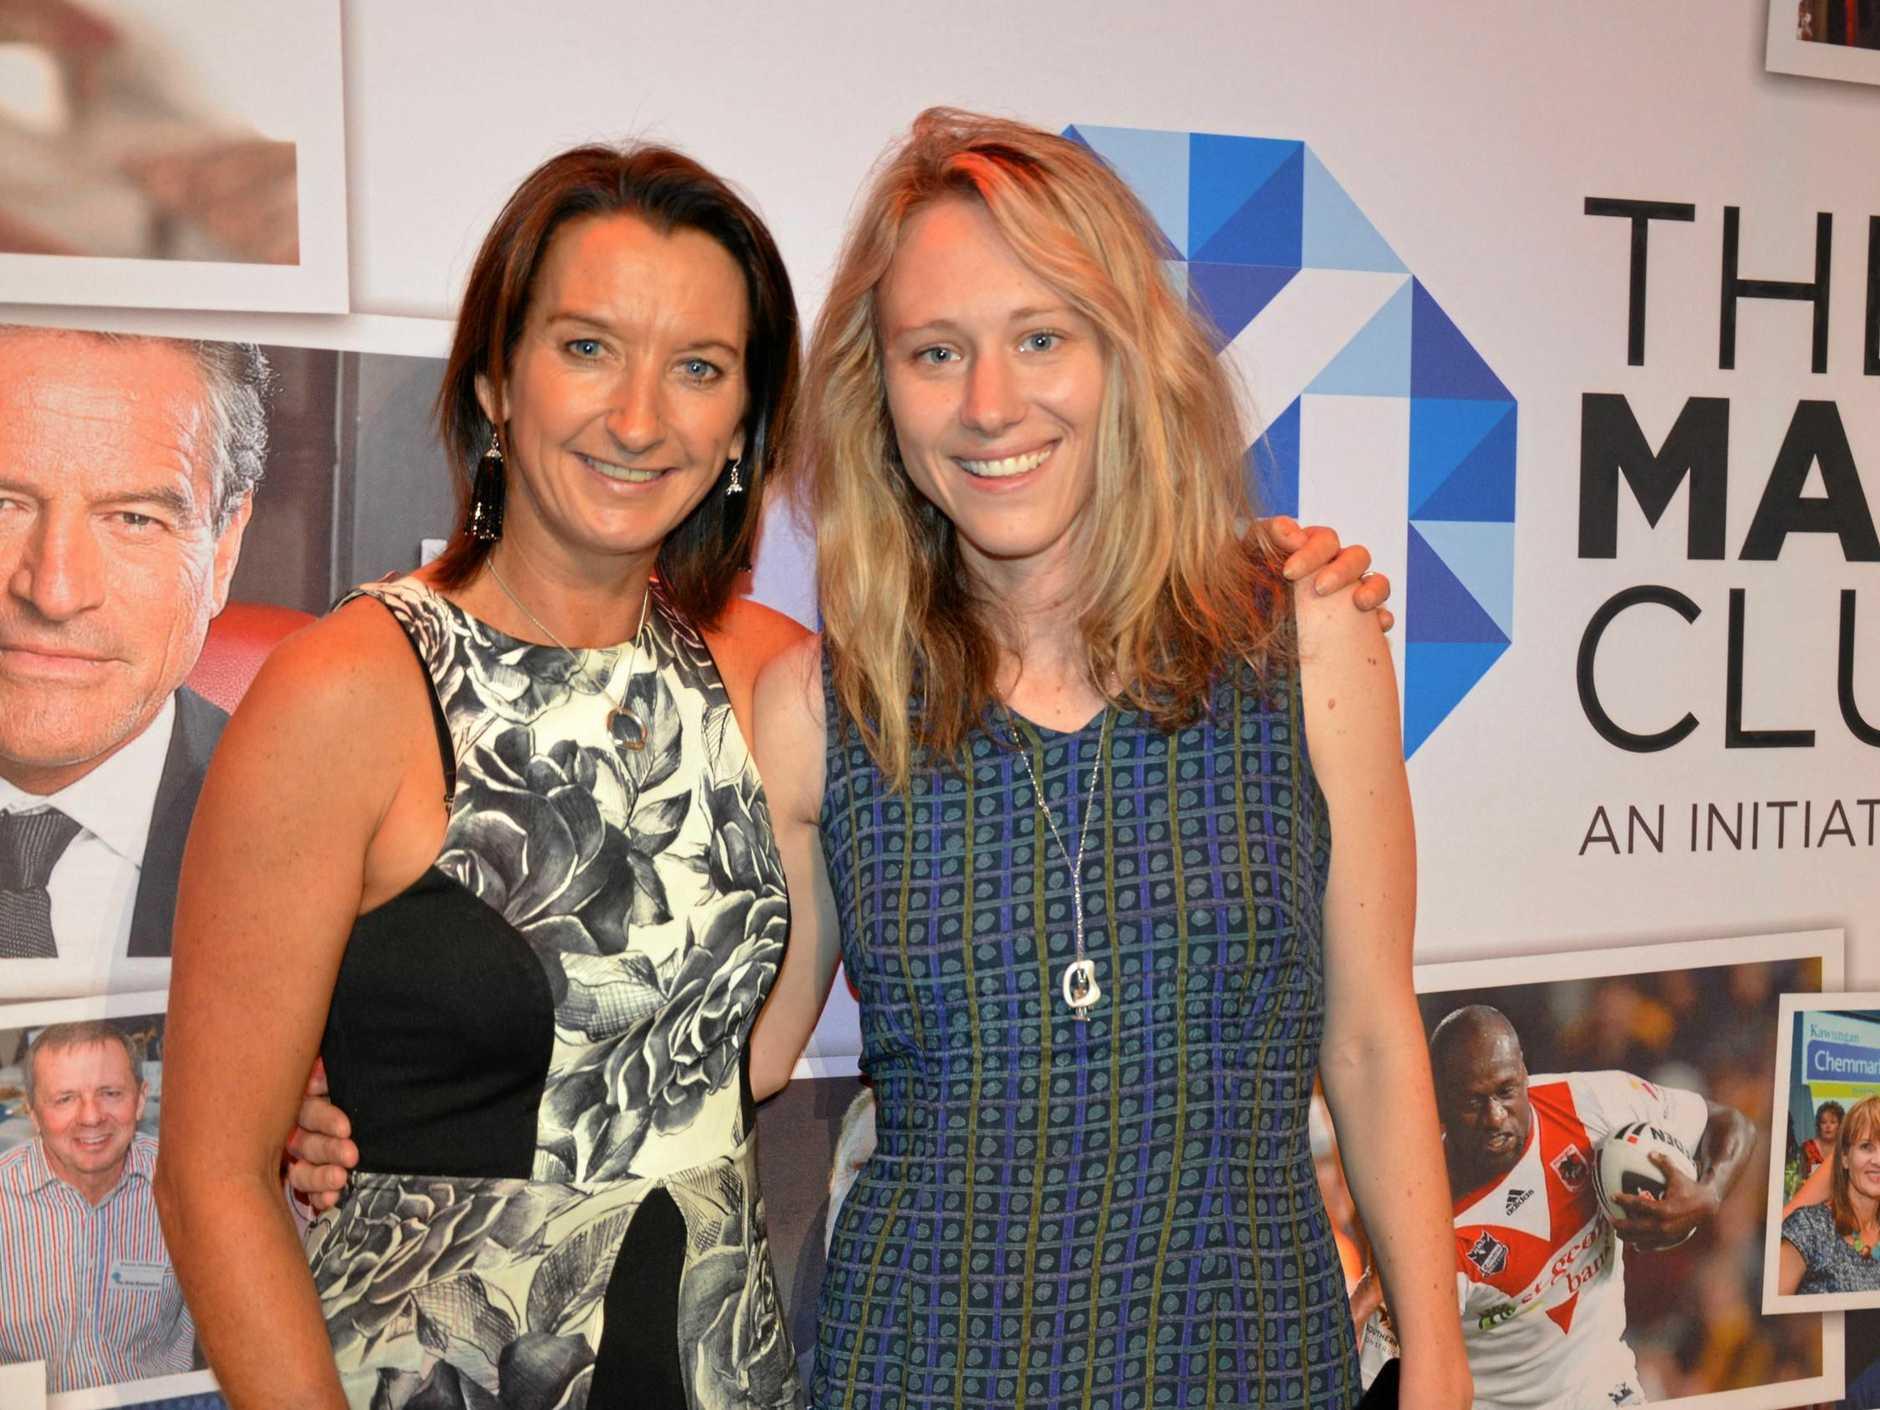 Daily Mercury editor Rowan Hunnam with Layne Beachley at Mackay Club's 'Tackle the Greatest Wave' at the MECC.